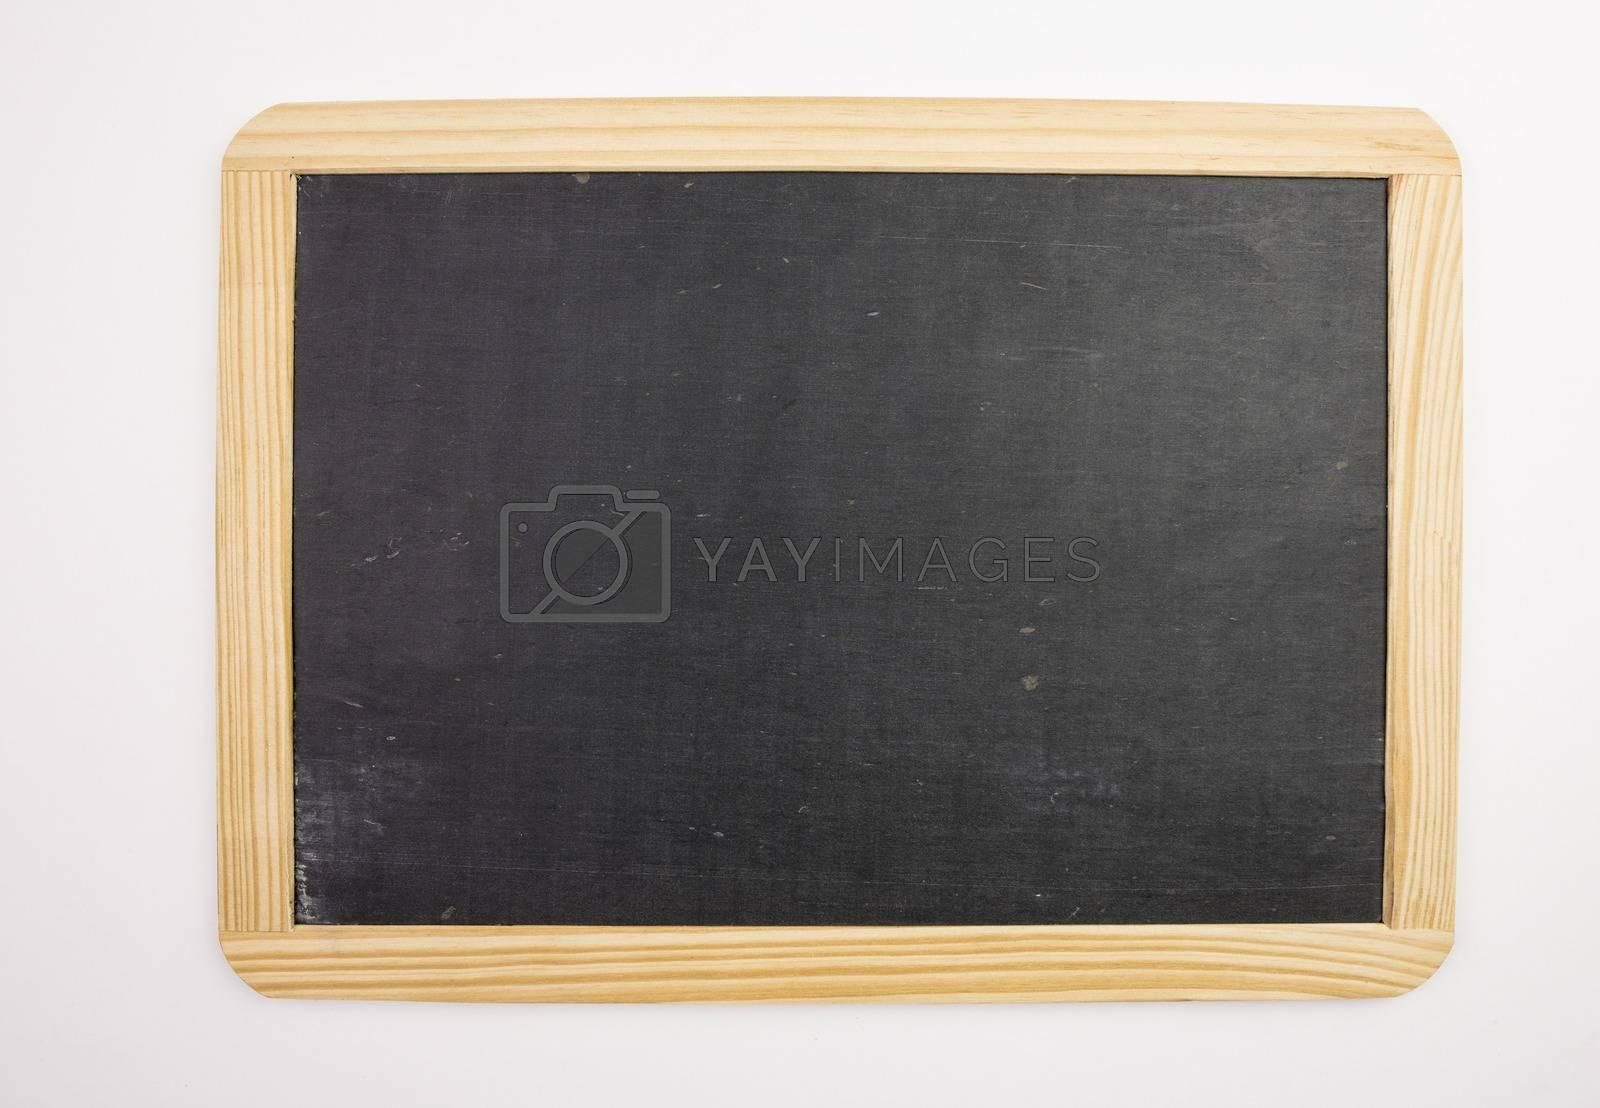 Royalty free image of Chalkboard by Wavebreakmedia